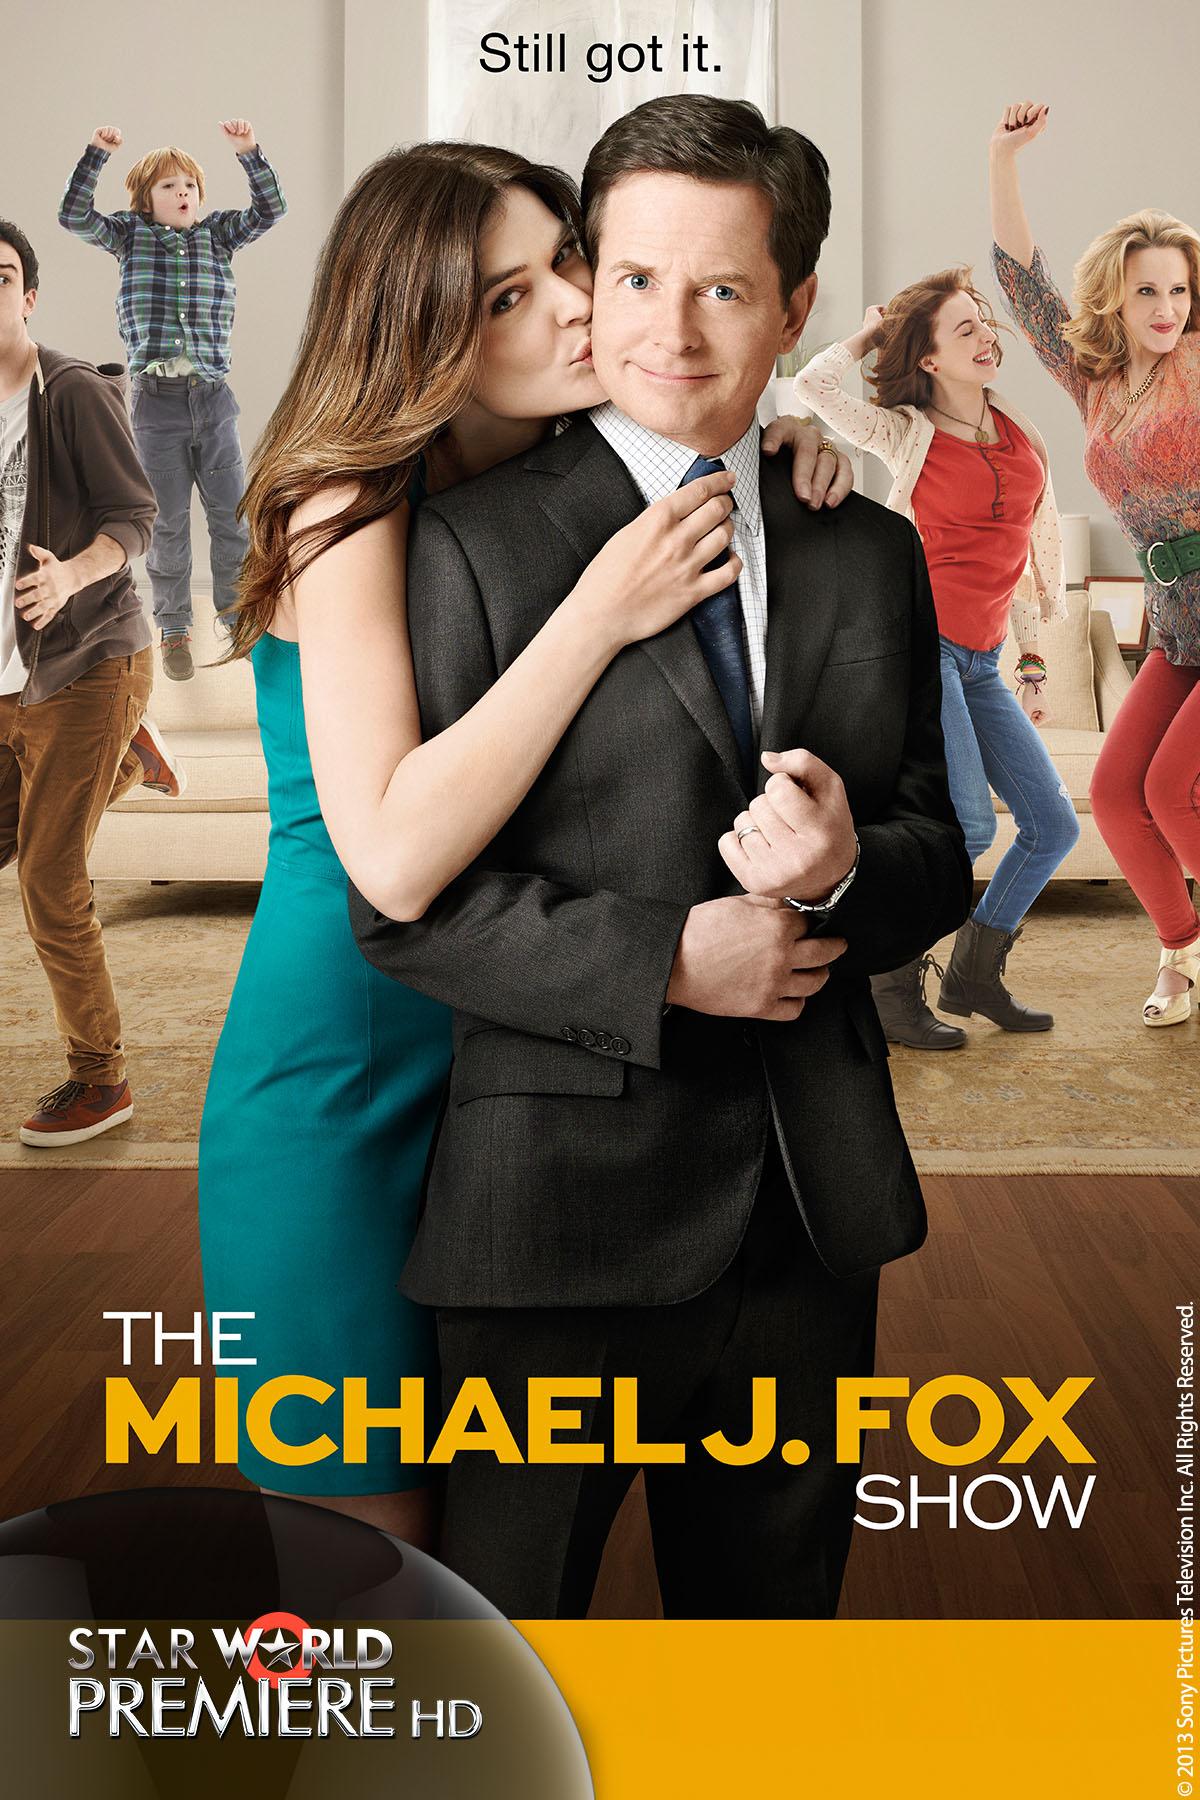 The-Micheal-J-Fox-Show-key-art